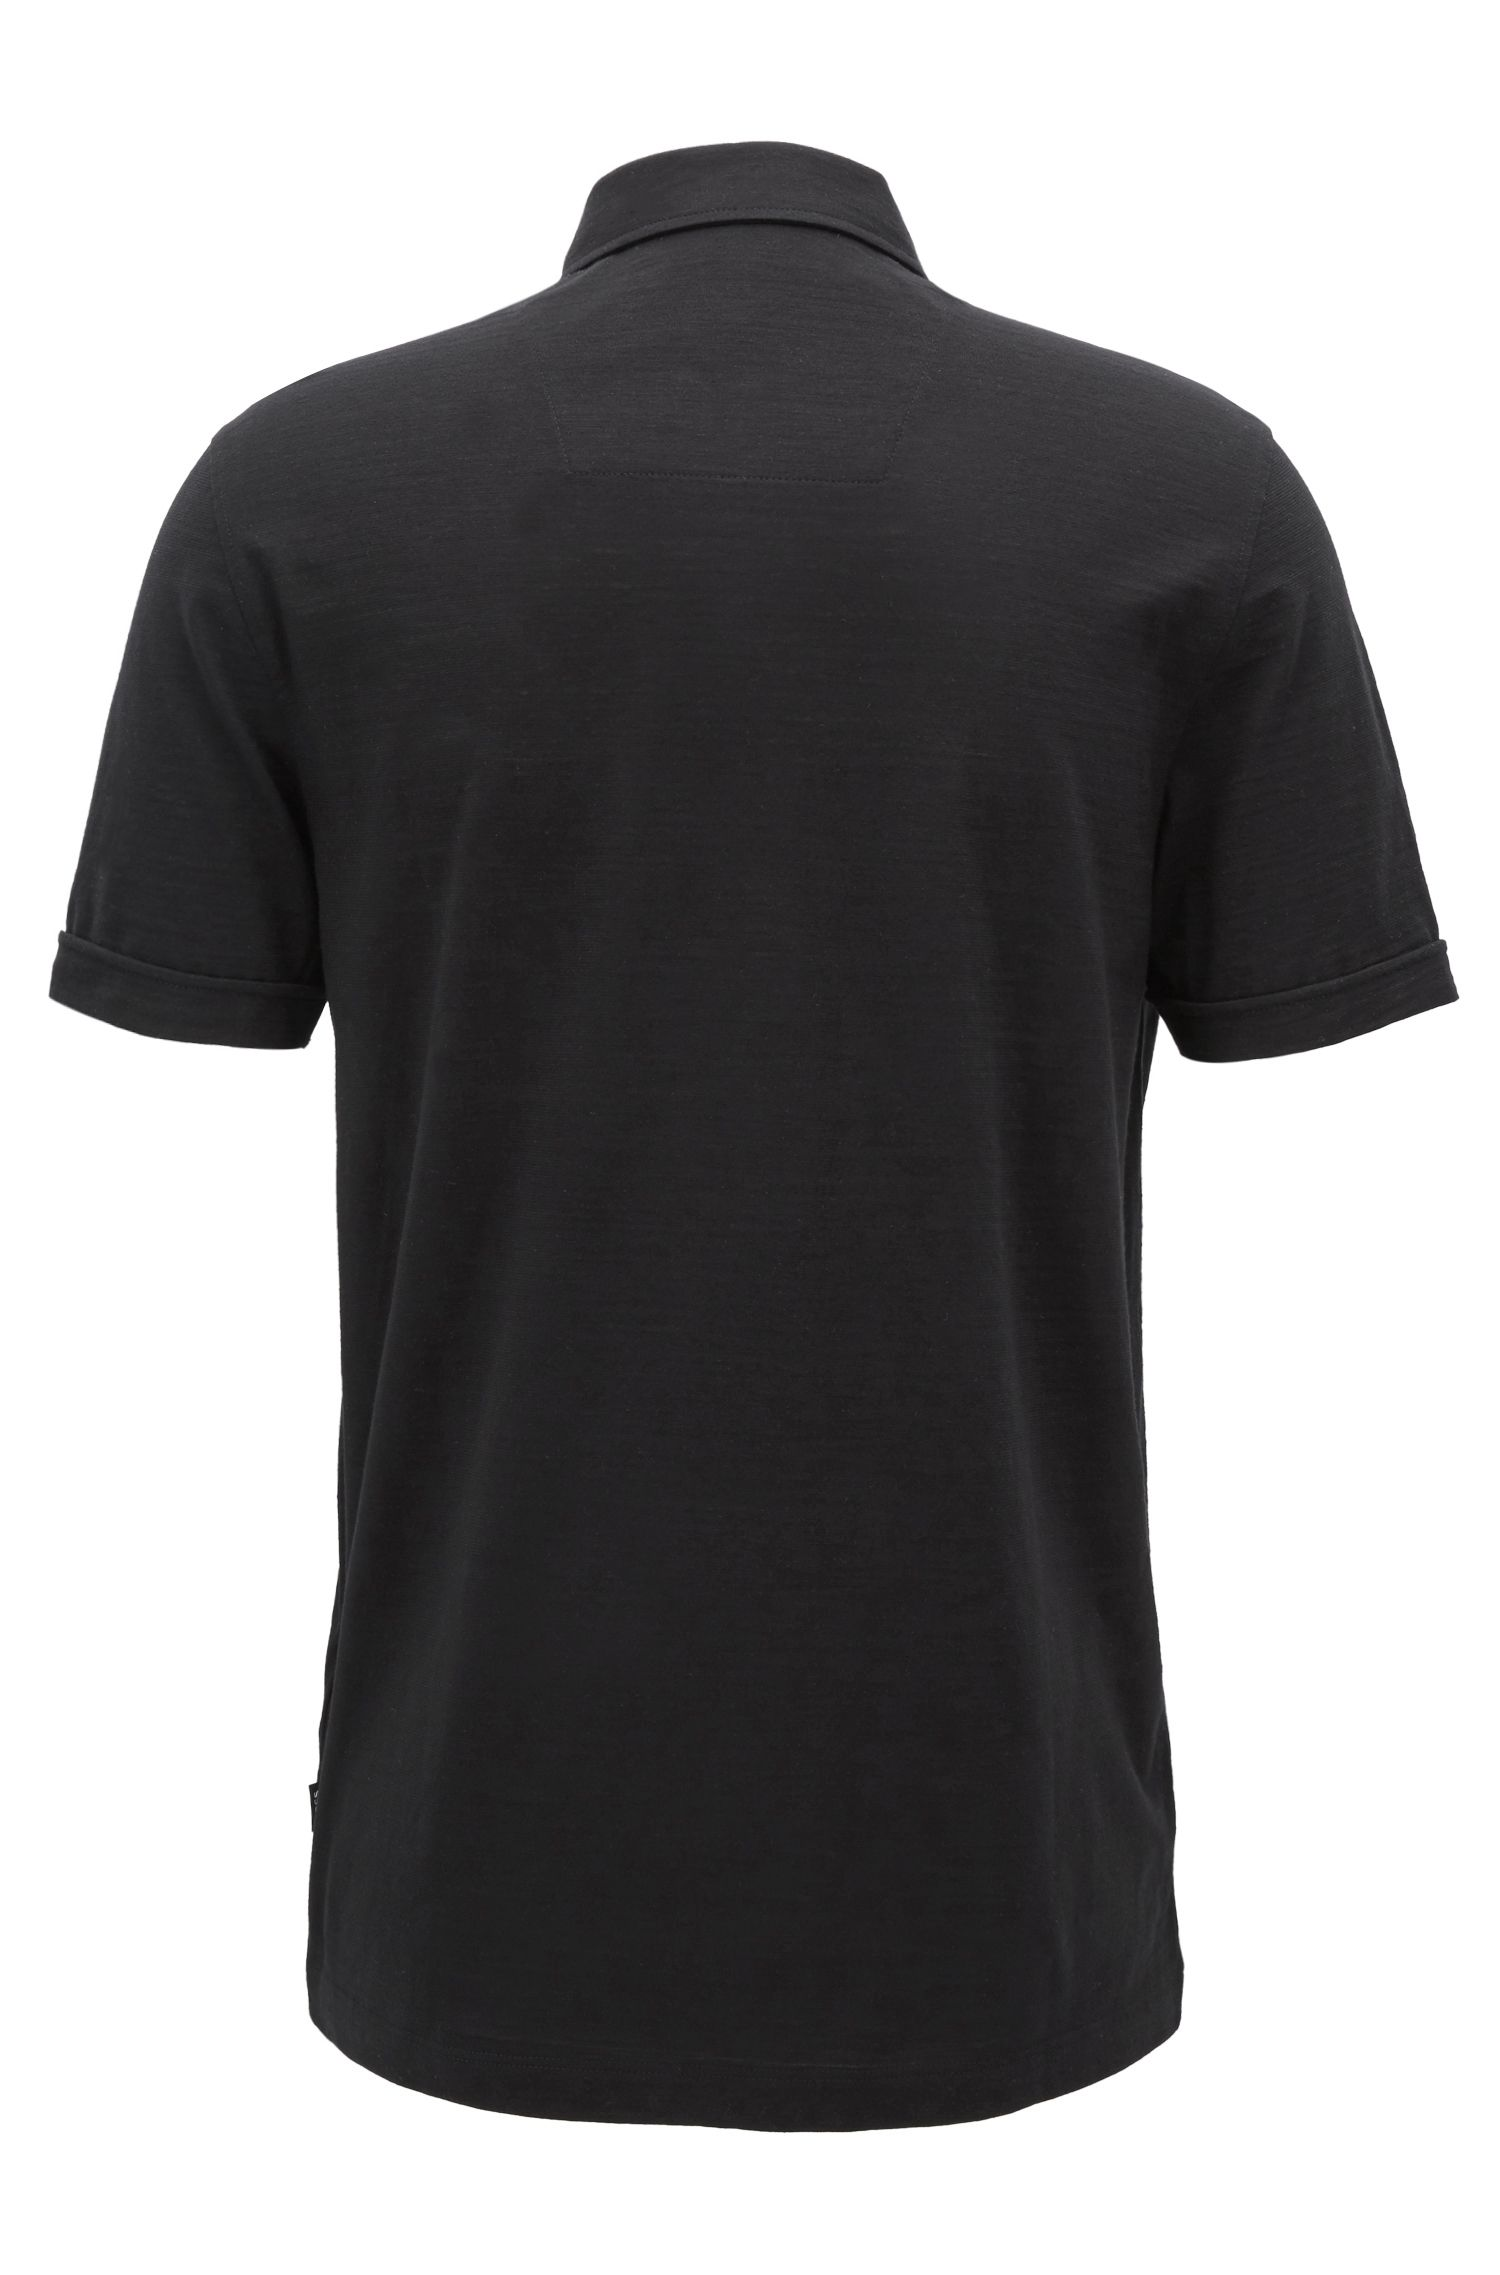 Polo met korte mouwen van gemerceriseerde single jersey